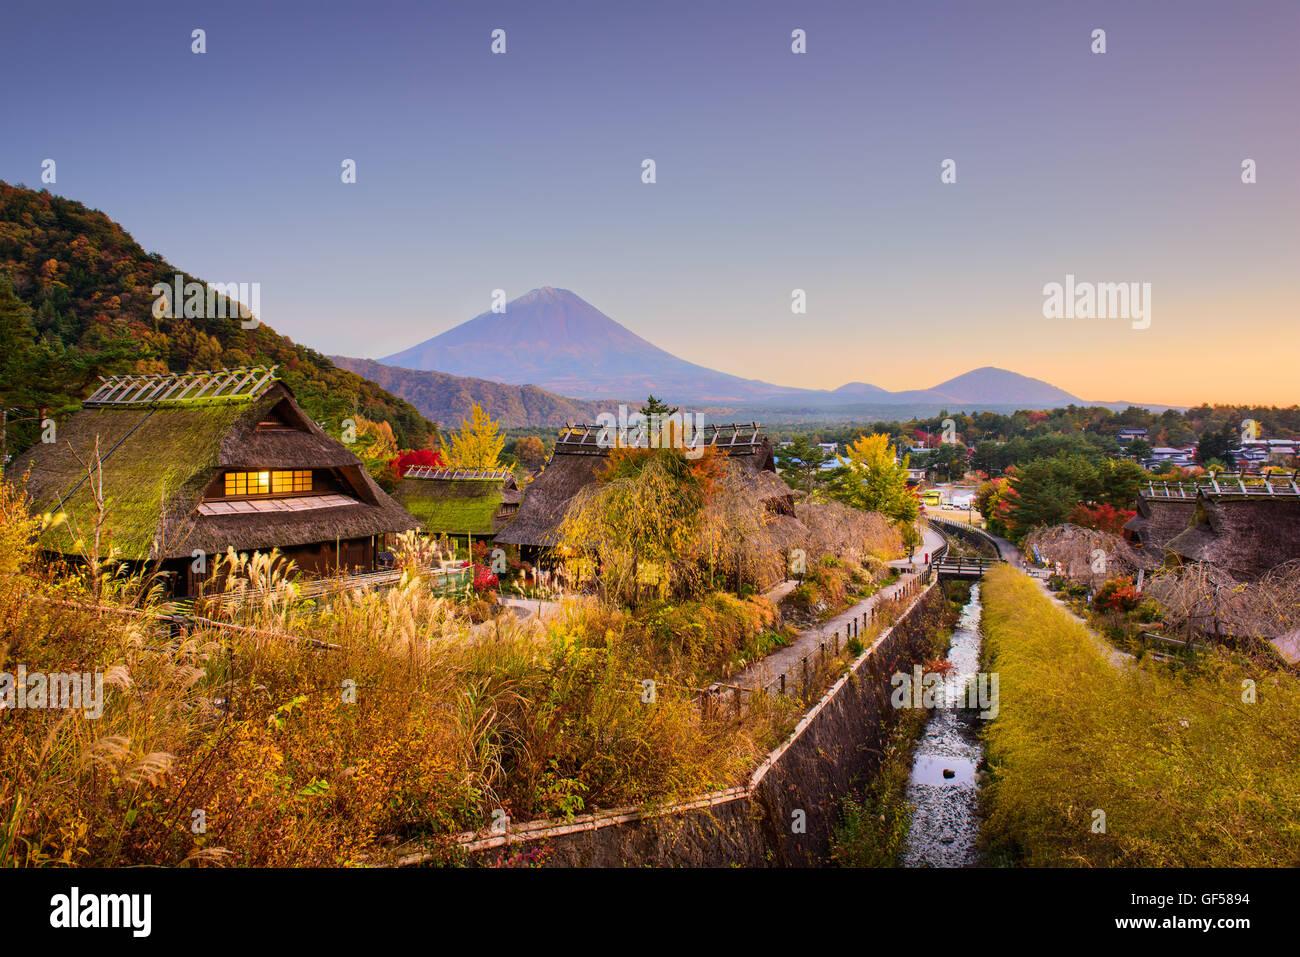 Mt. Fuji, Japan with historic village Iyashi no Sato during autumn. - Stock Image